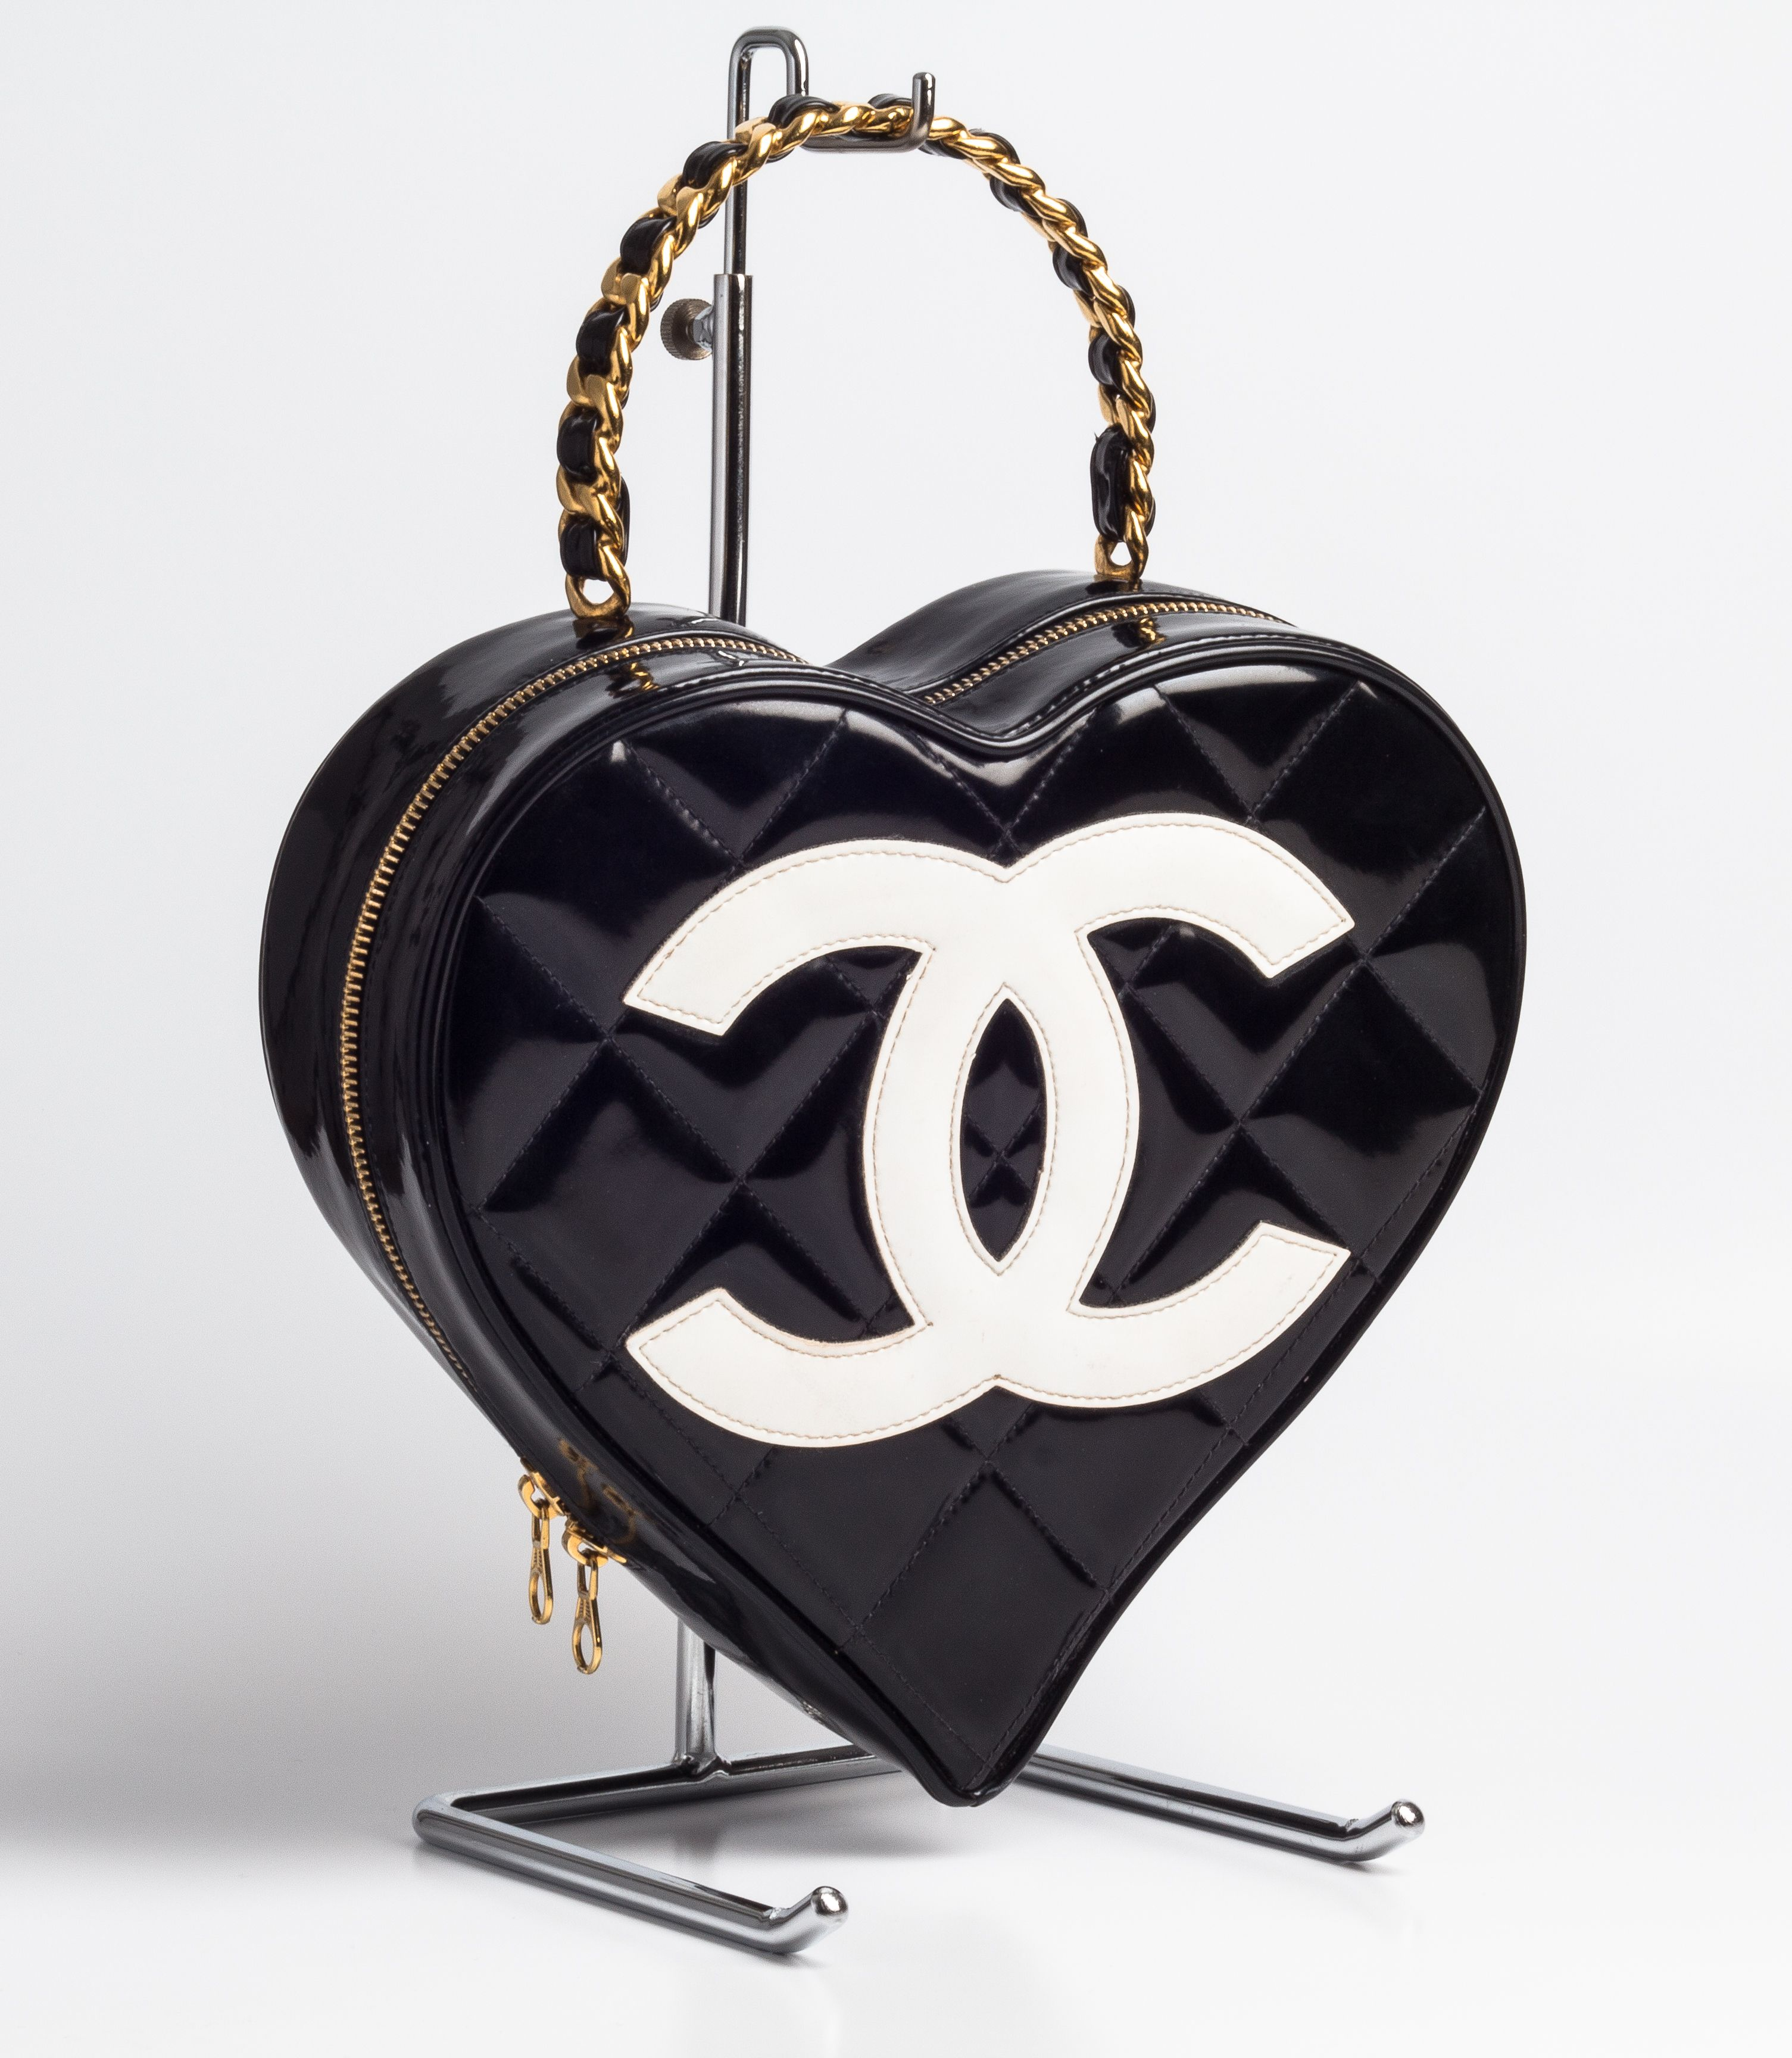 96586083bdf1 Vintage Chanel Heart Bag Limited Edition Sold in June 2013 | CHANEL ...